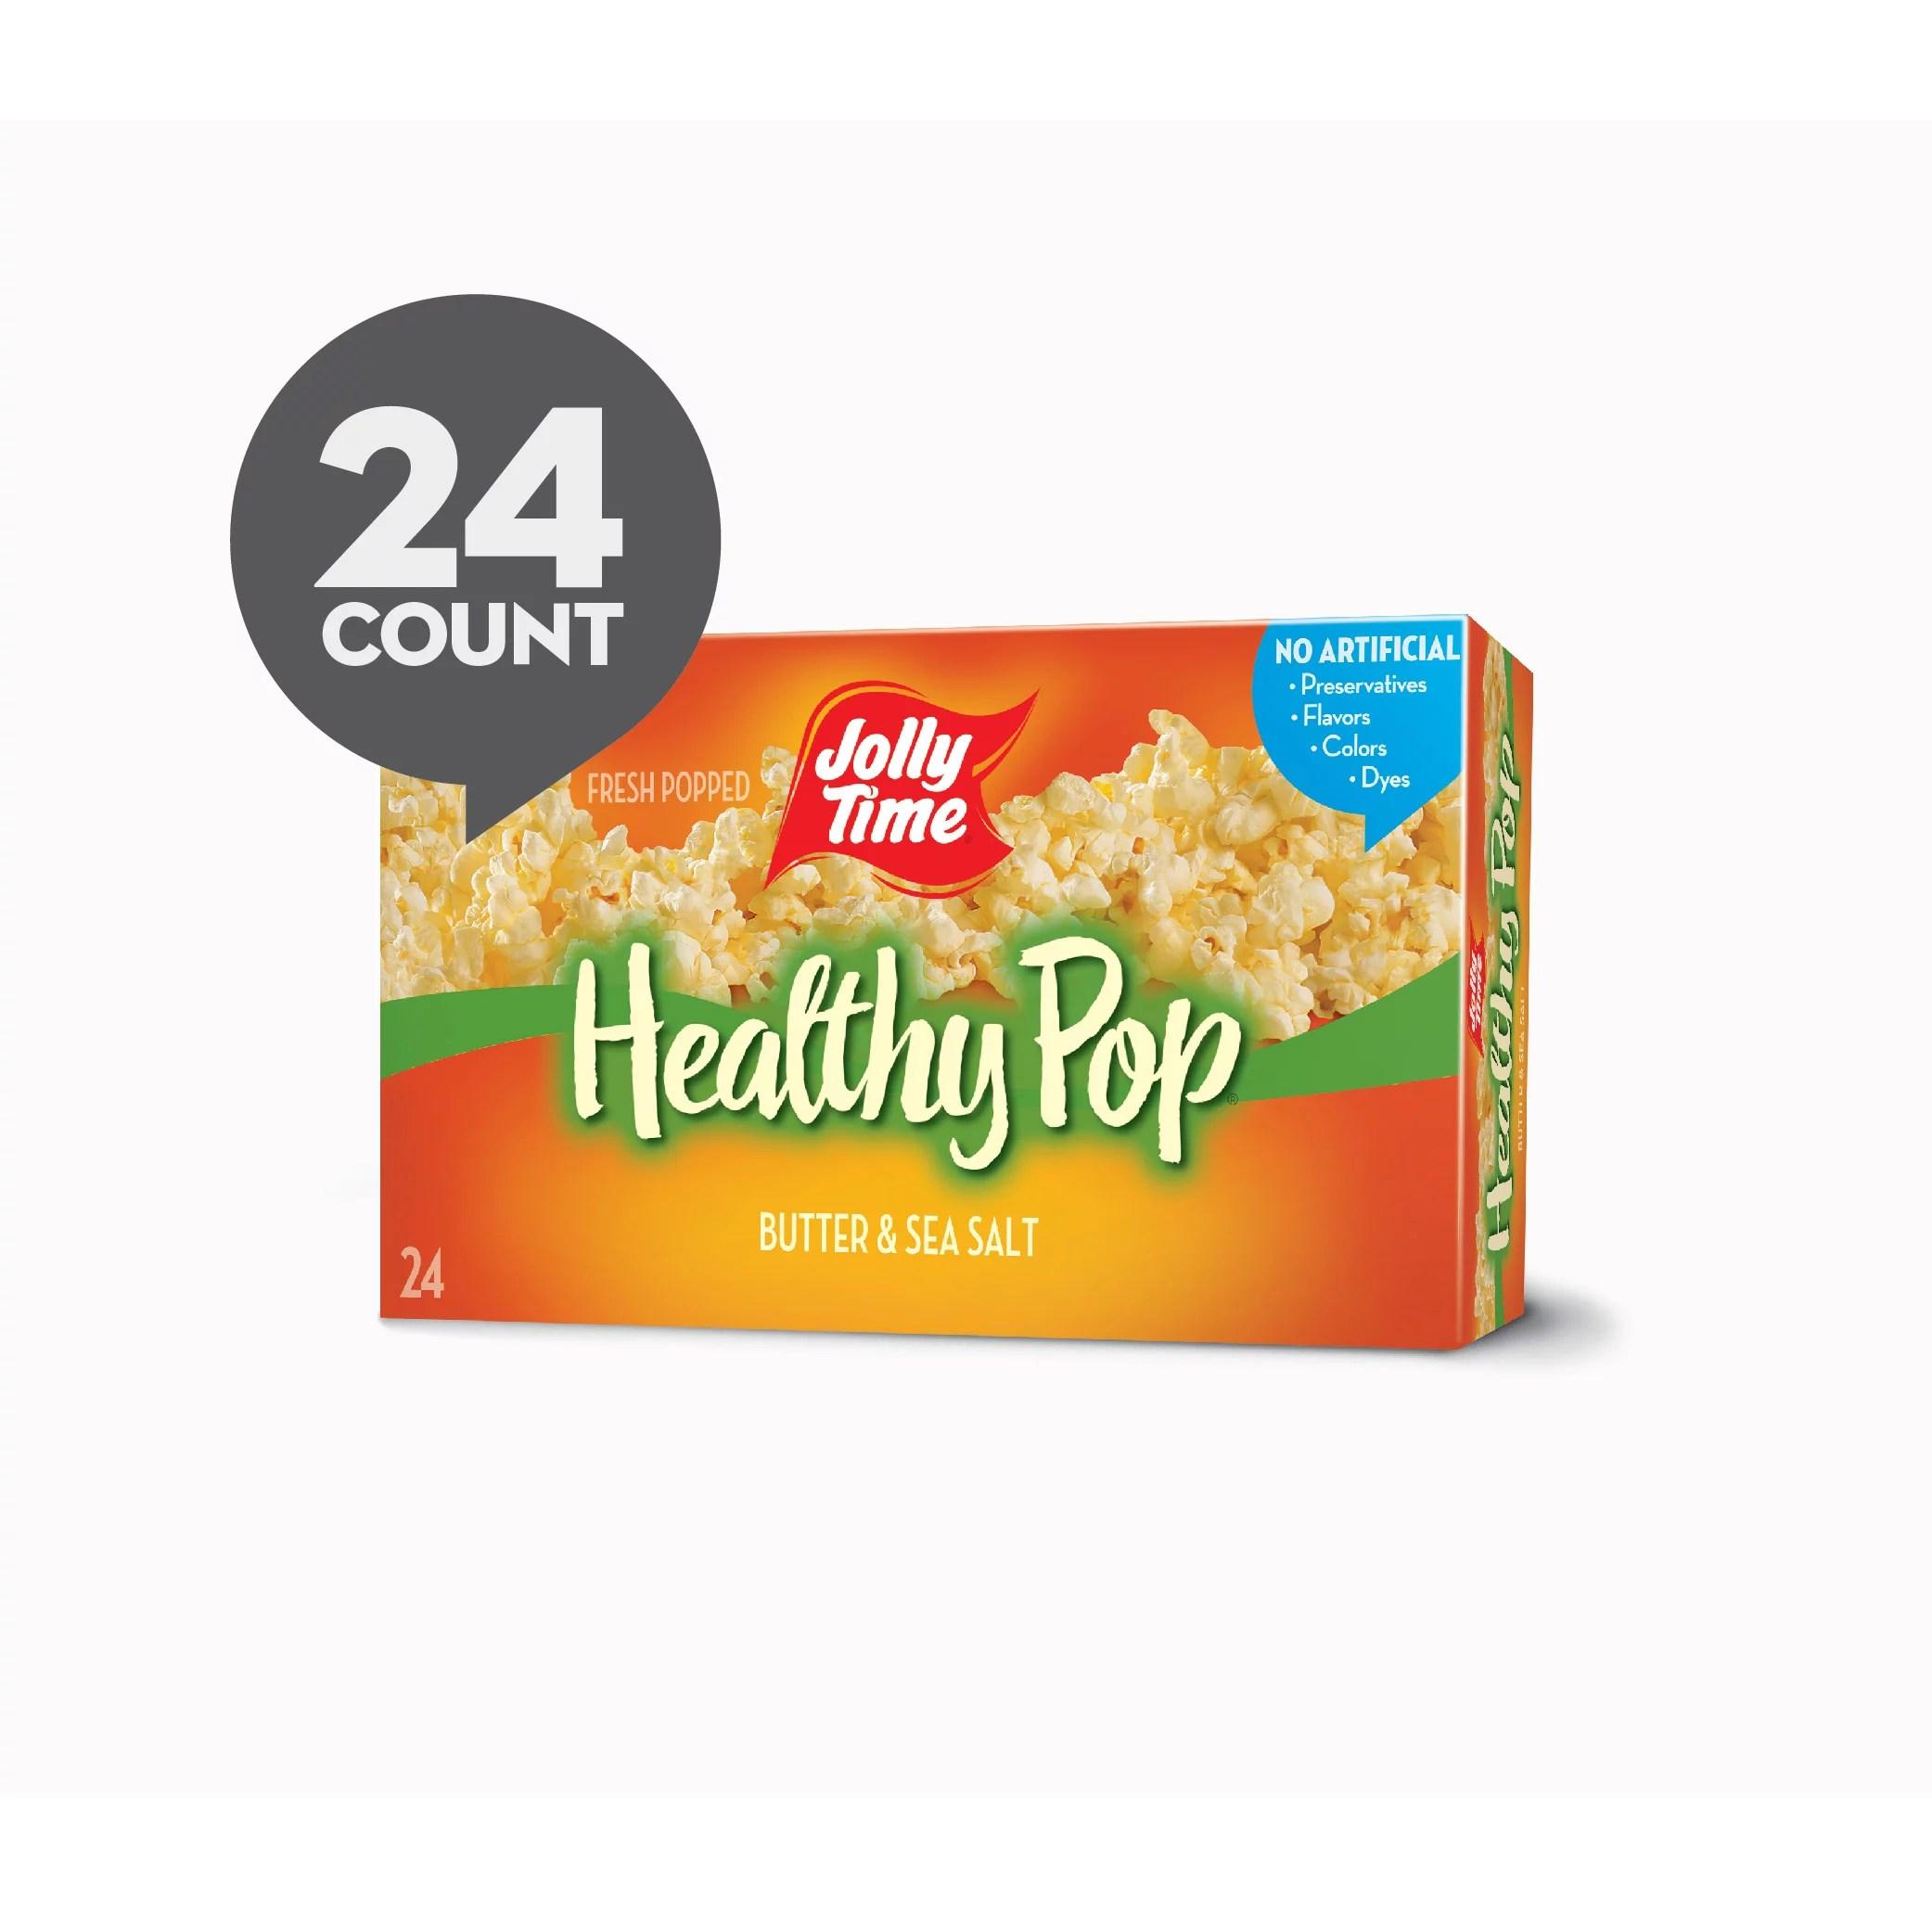 jolly time butter sea salt healthy pop microwave popcorn 3 oz 24 count walmart com